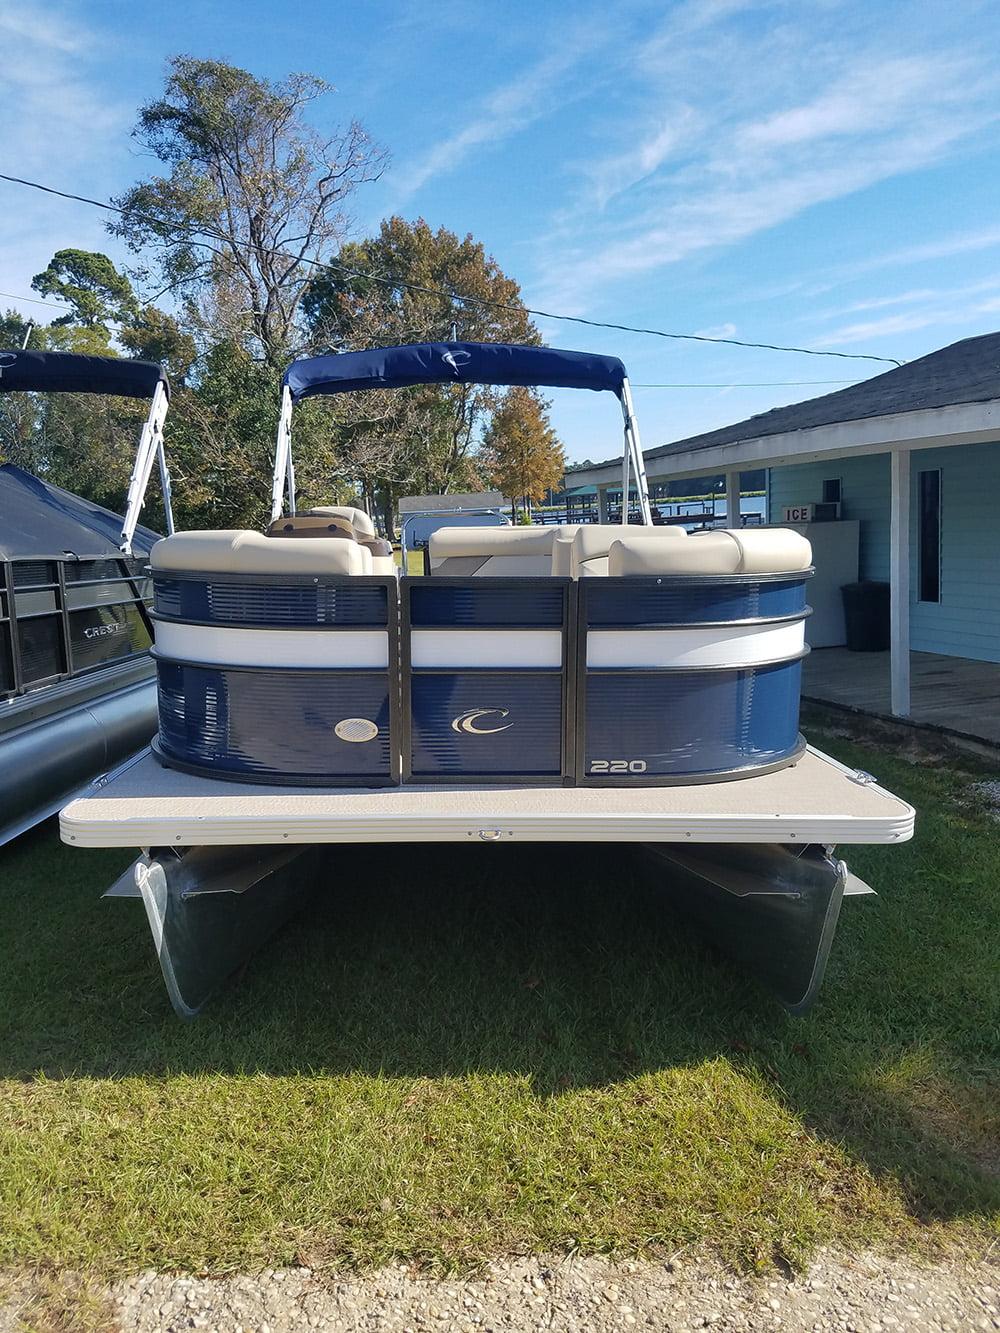 2019 CREST I 220L BLUE/WHITE - Meares Marine